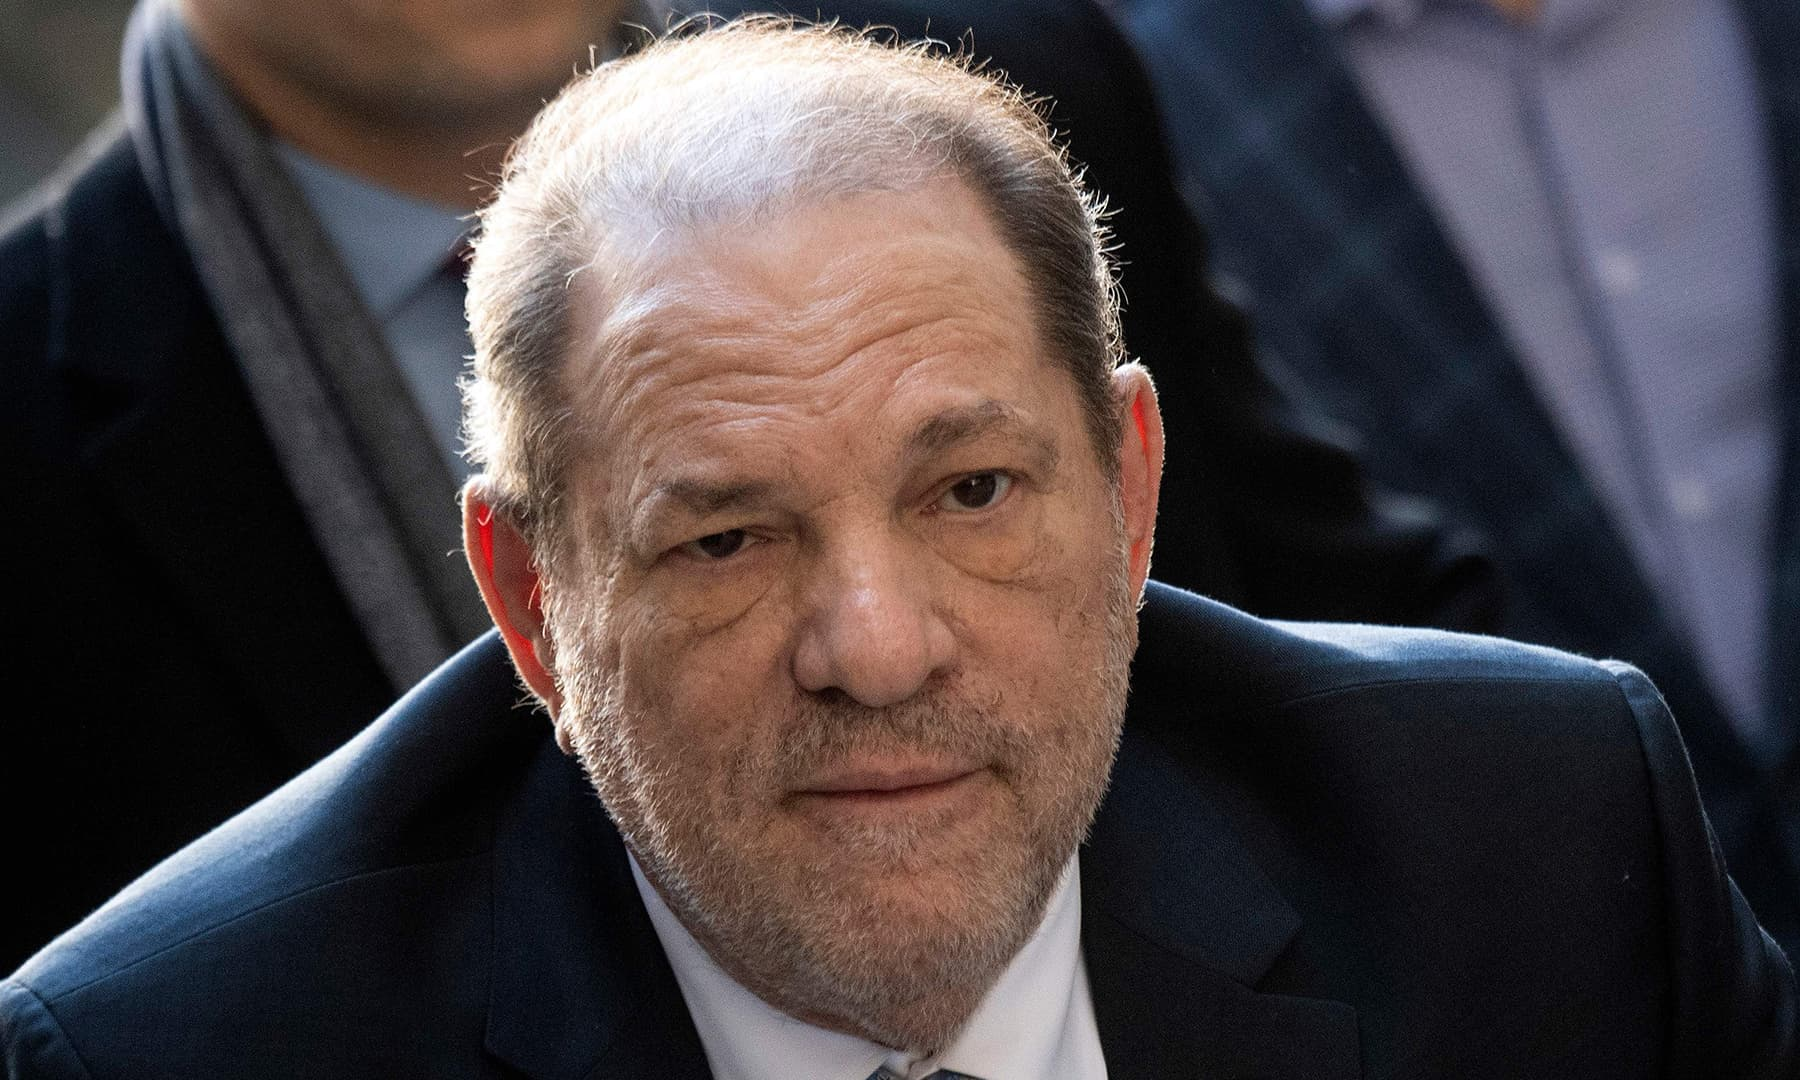 Harvey Weinstein arrives at the Manhattan Criminal Court on Feb 24. — AFP